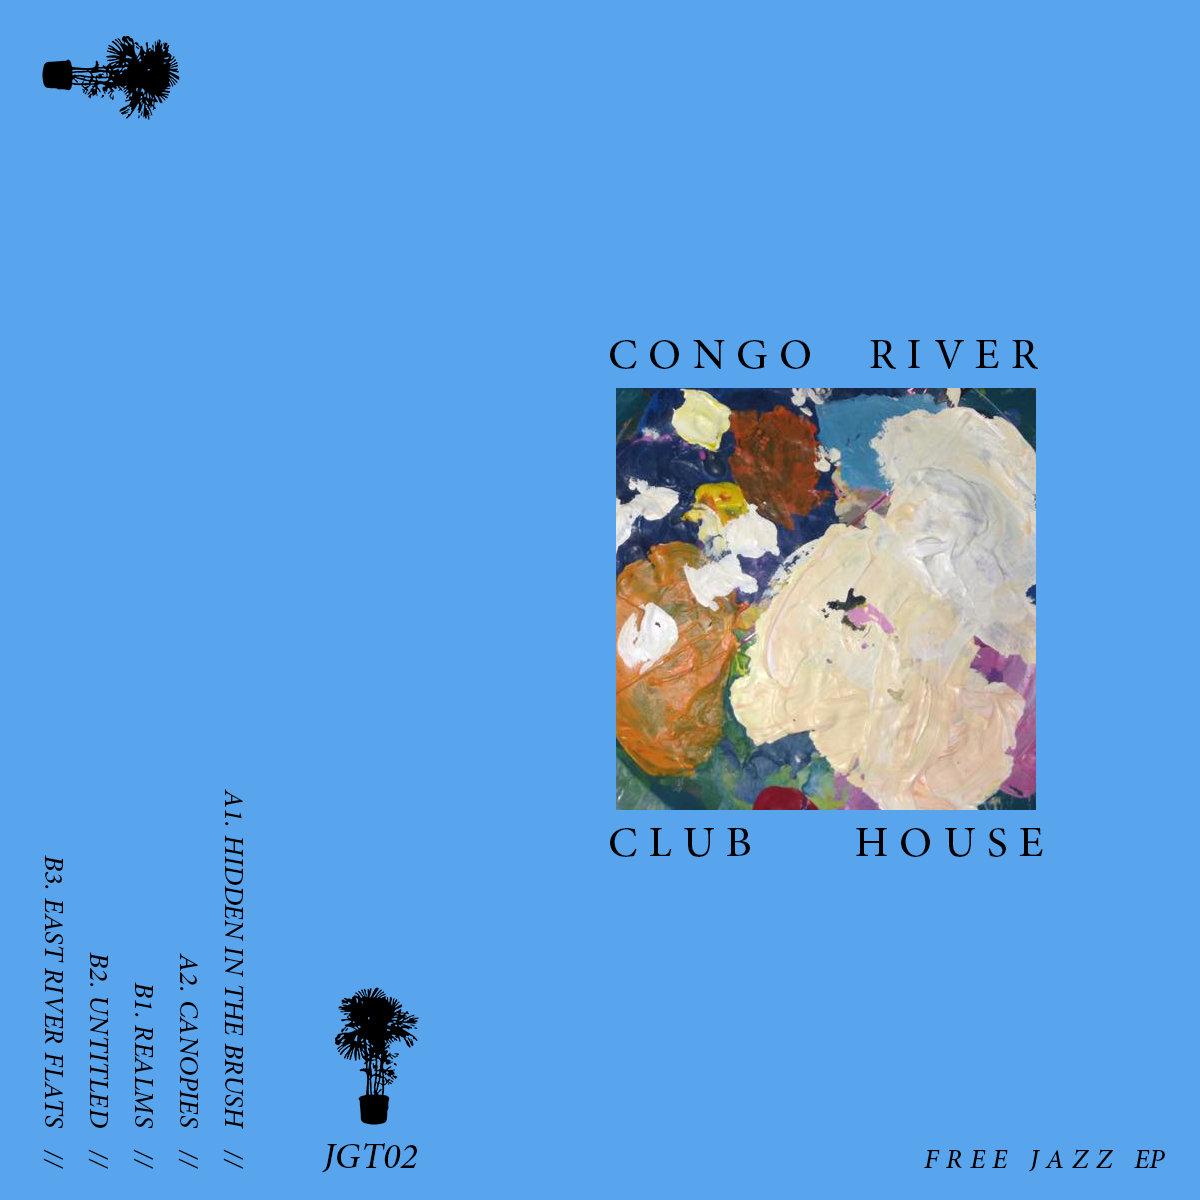 JGT Free Jazz EP JUNGLE GYM RECORDS - World map congo river